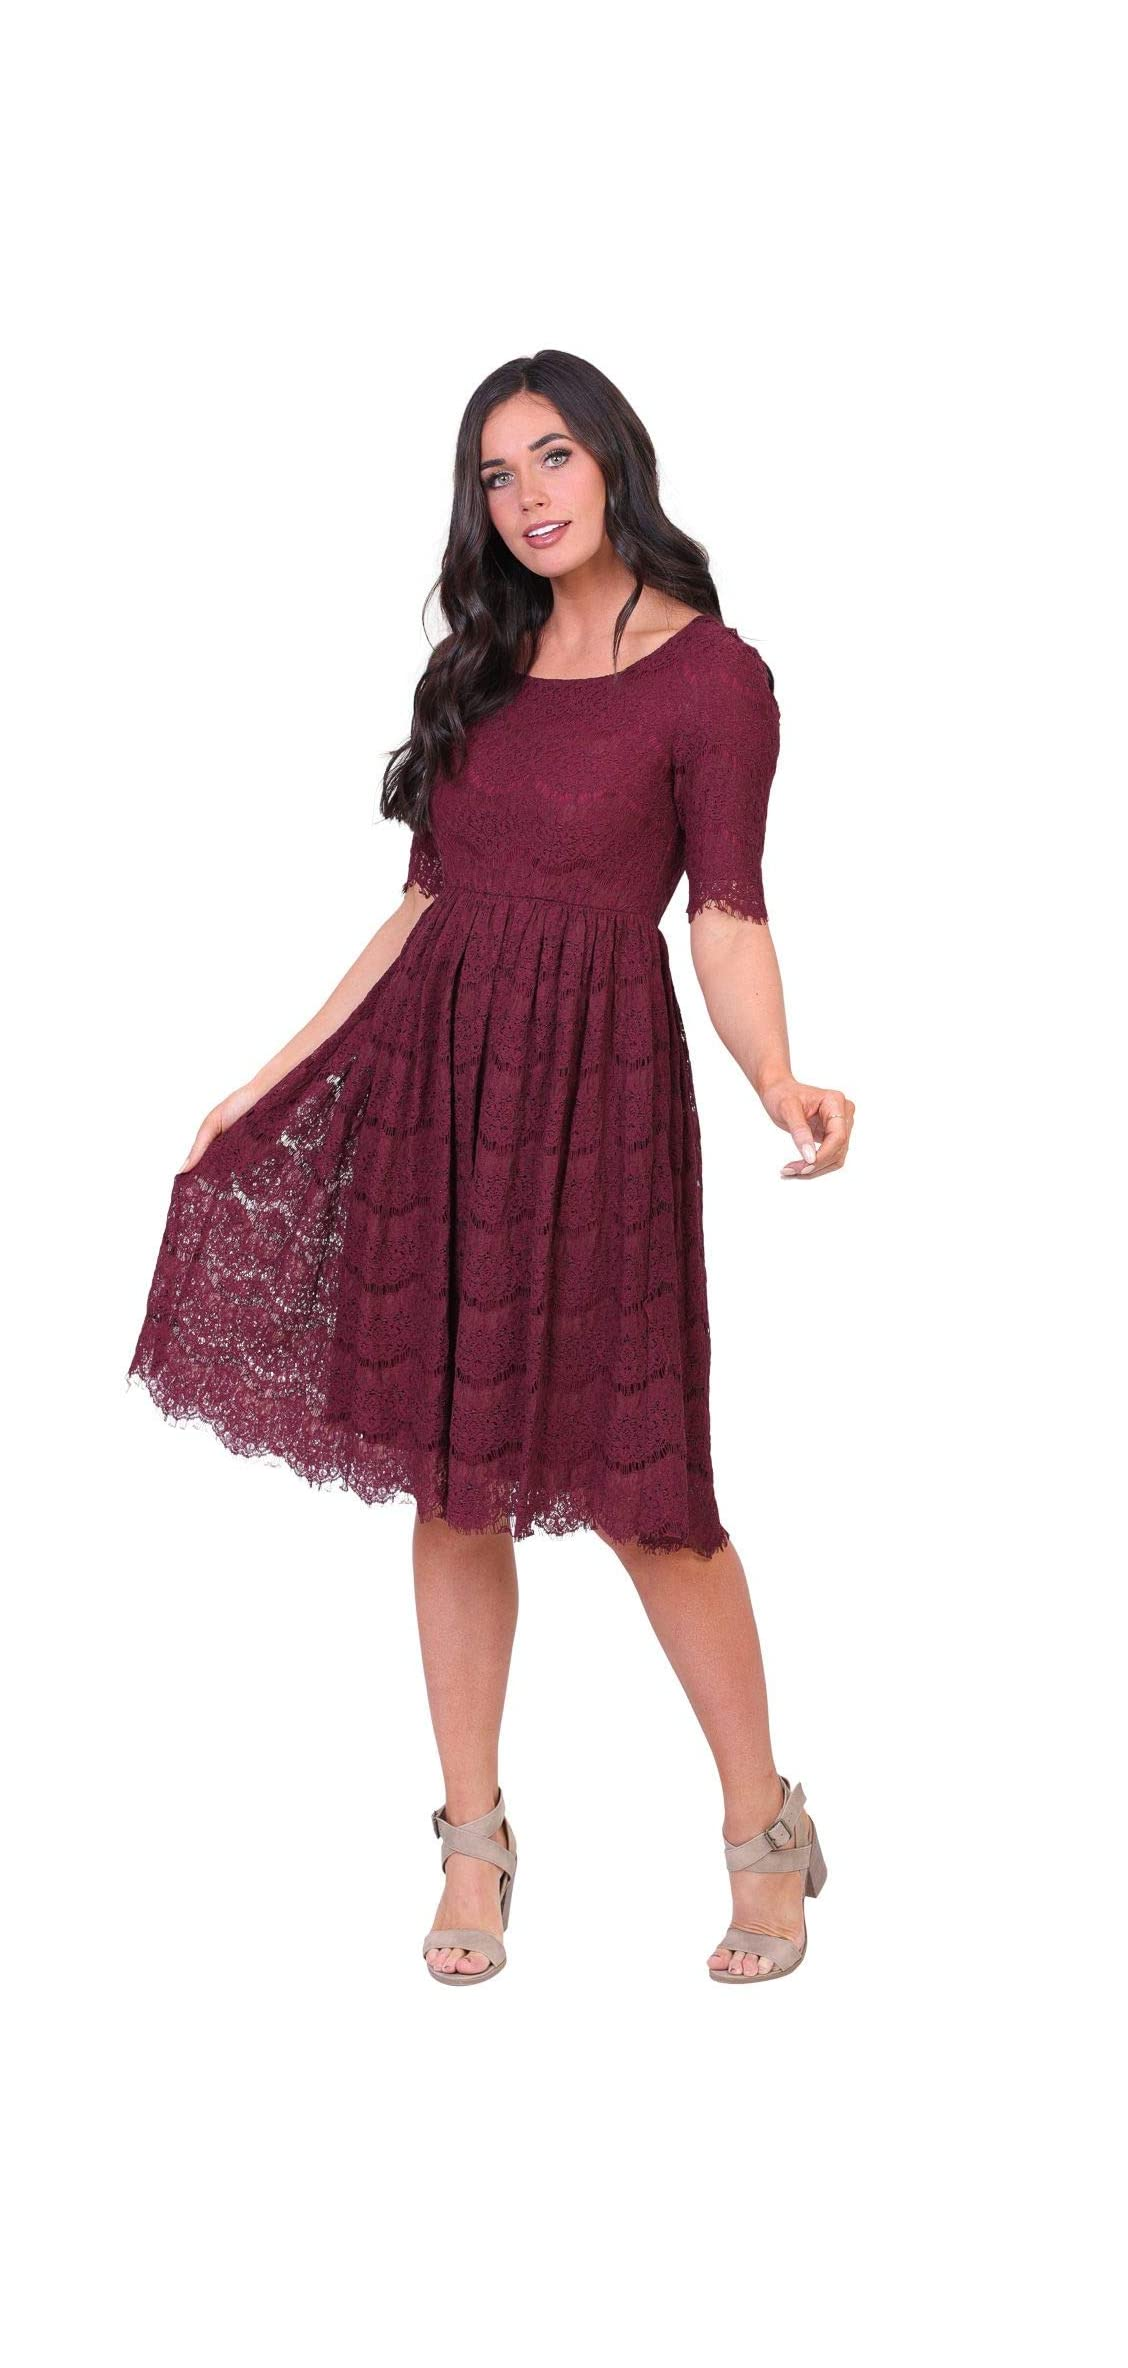 Women's Evelyn Modest Half-sleeve A-line Lace Dress